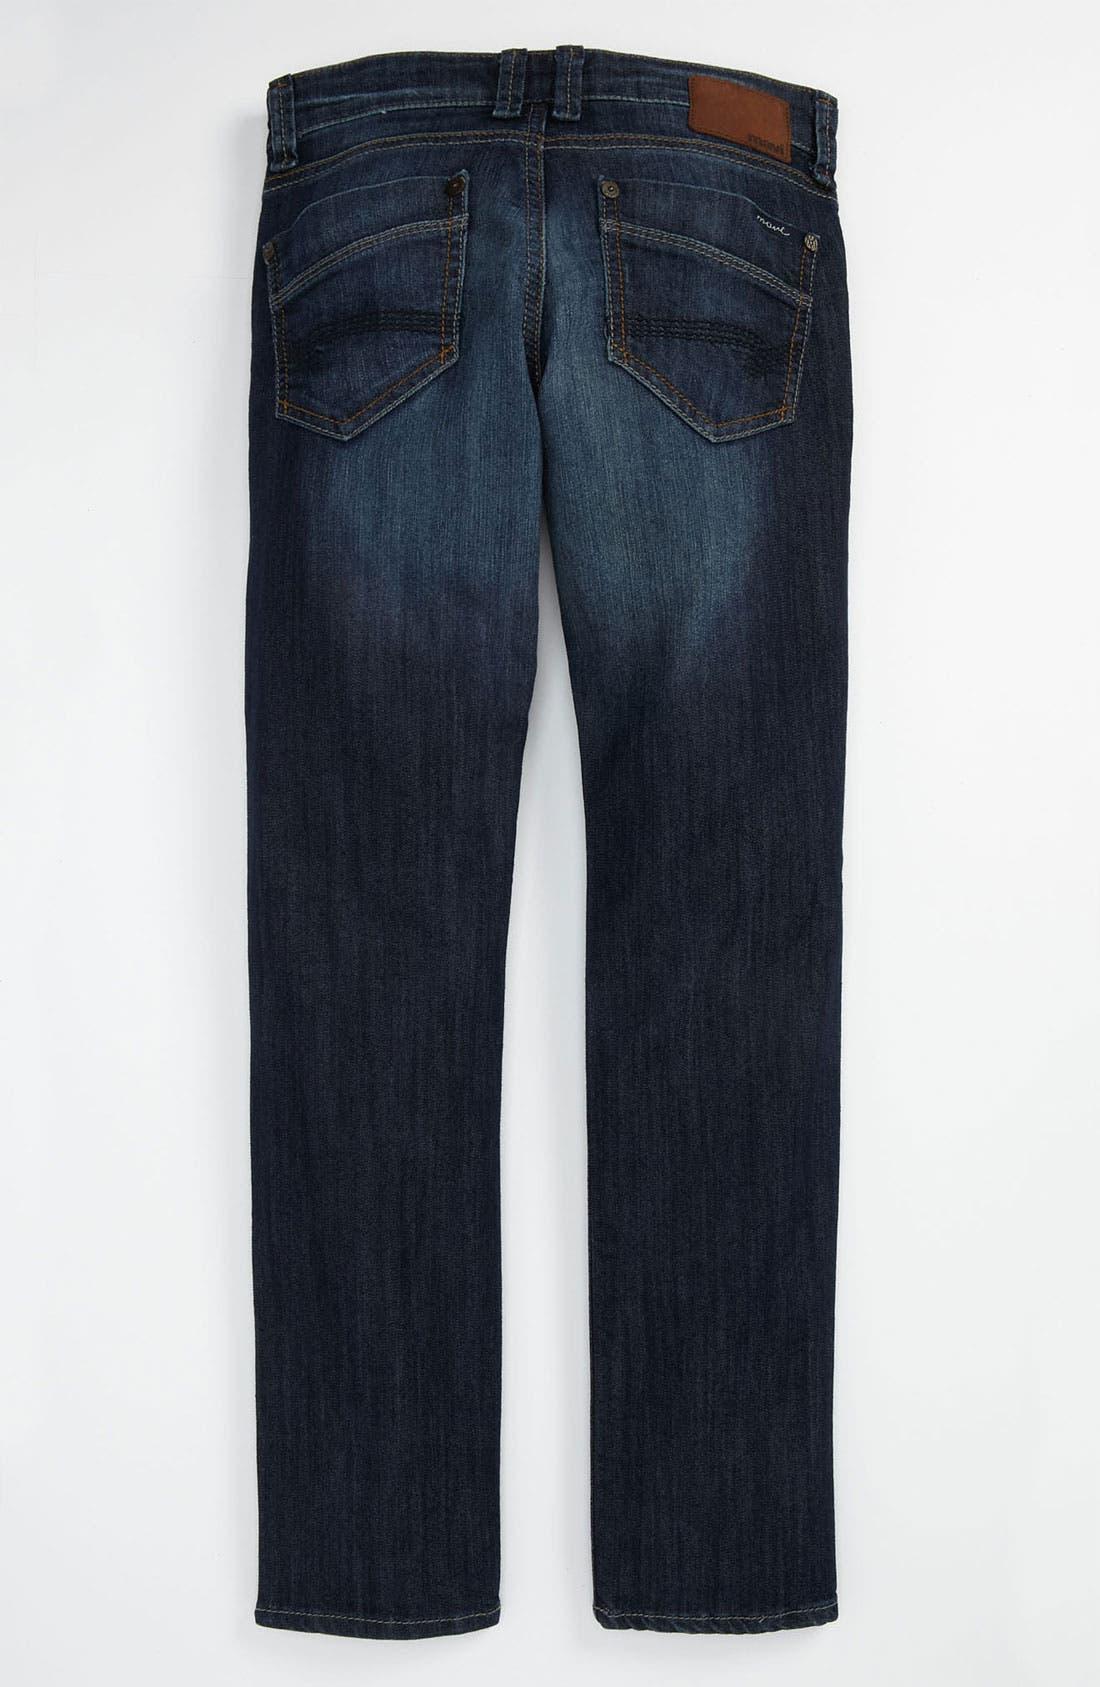 Alternate Image 1 Selected - Mavi Jeans 'Justin' Jeans (Big Boys)